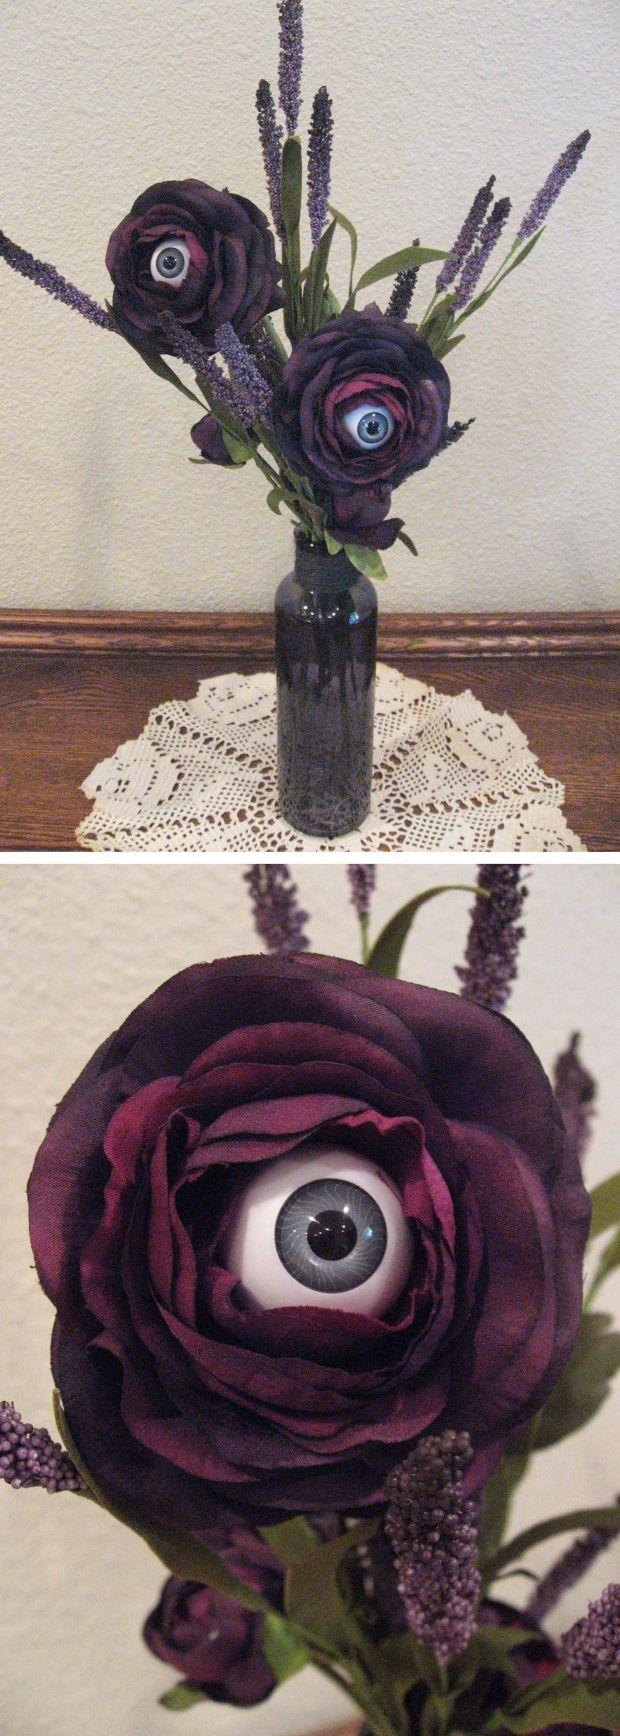 DIY Halloween Decorations | Halloween Bash | Pinterest | Red roses ...